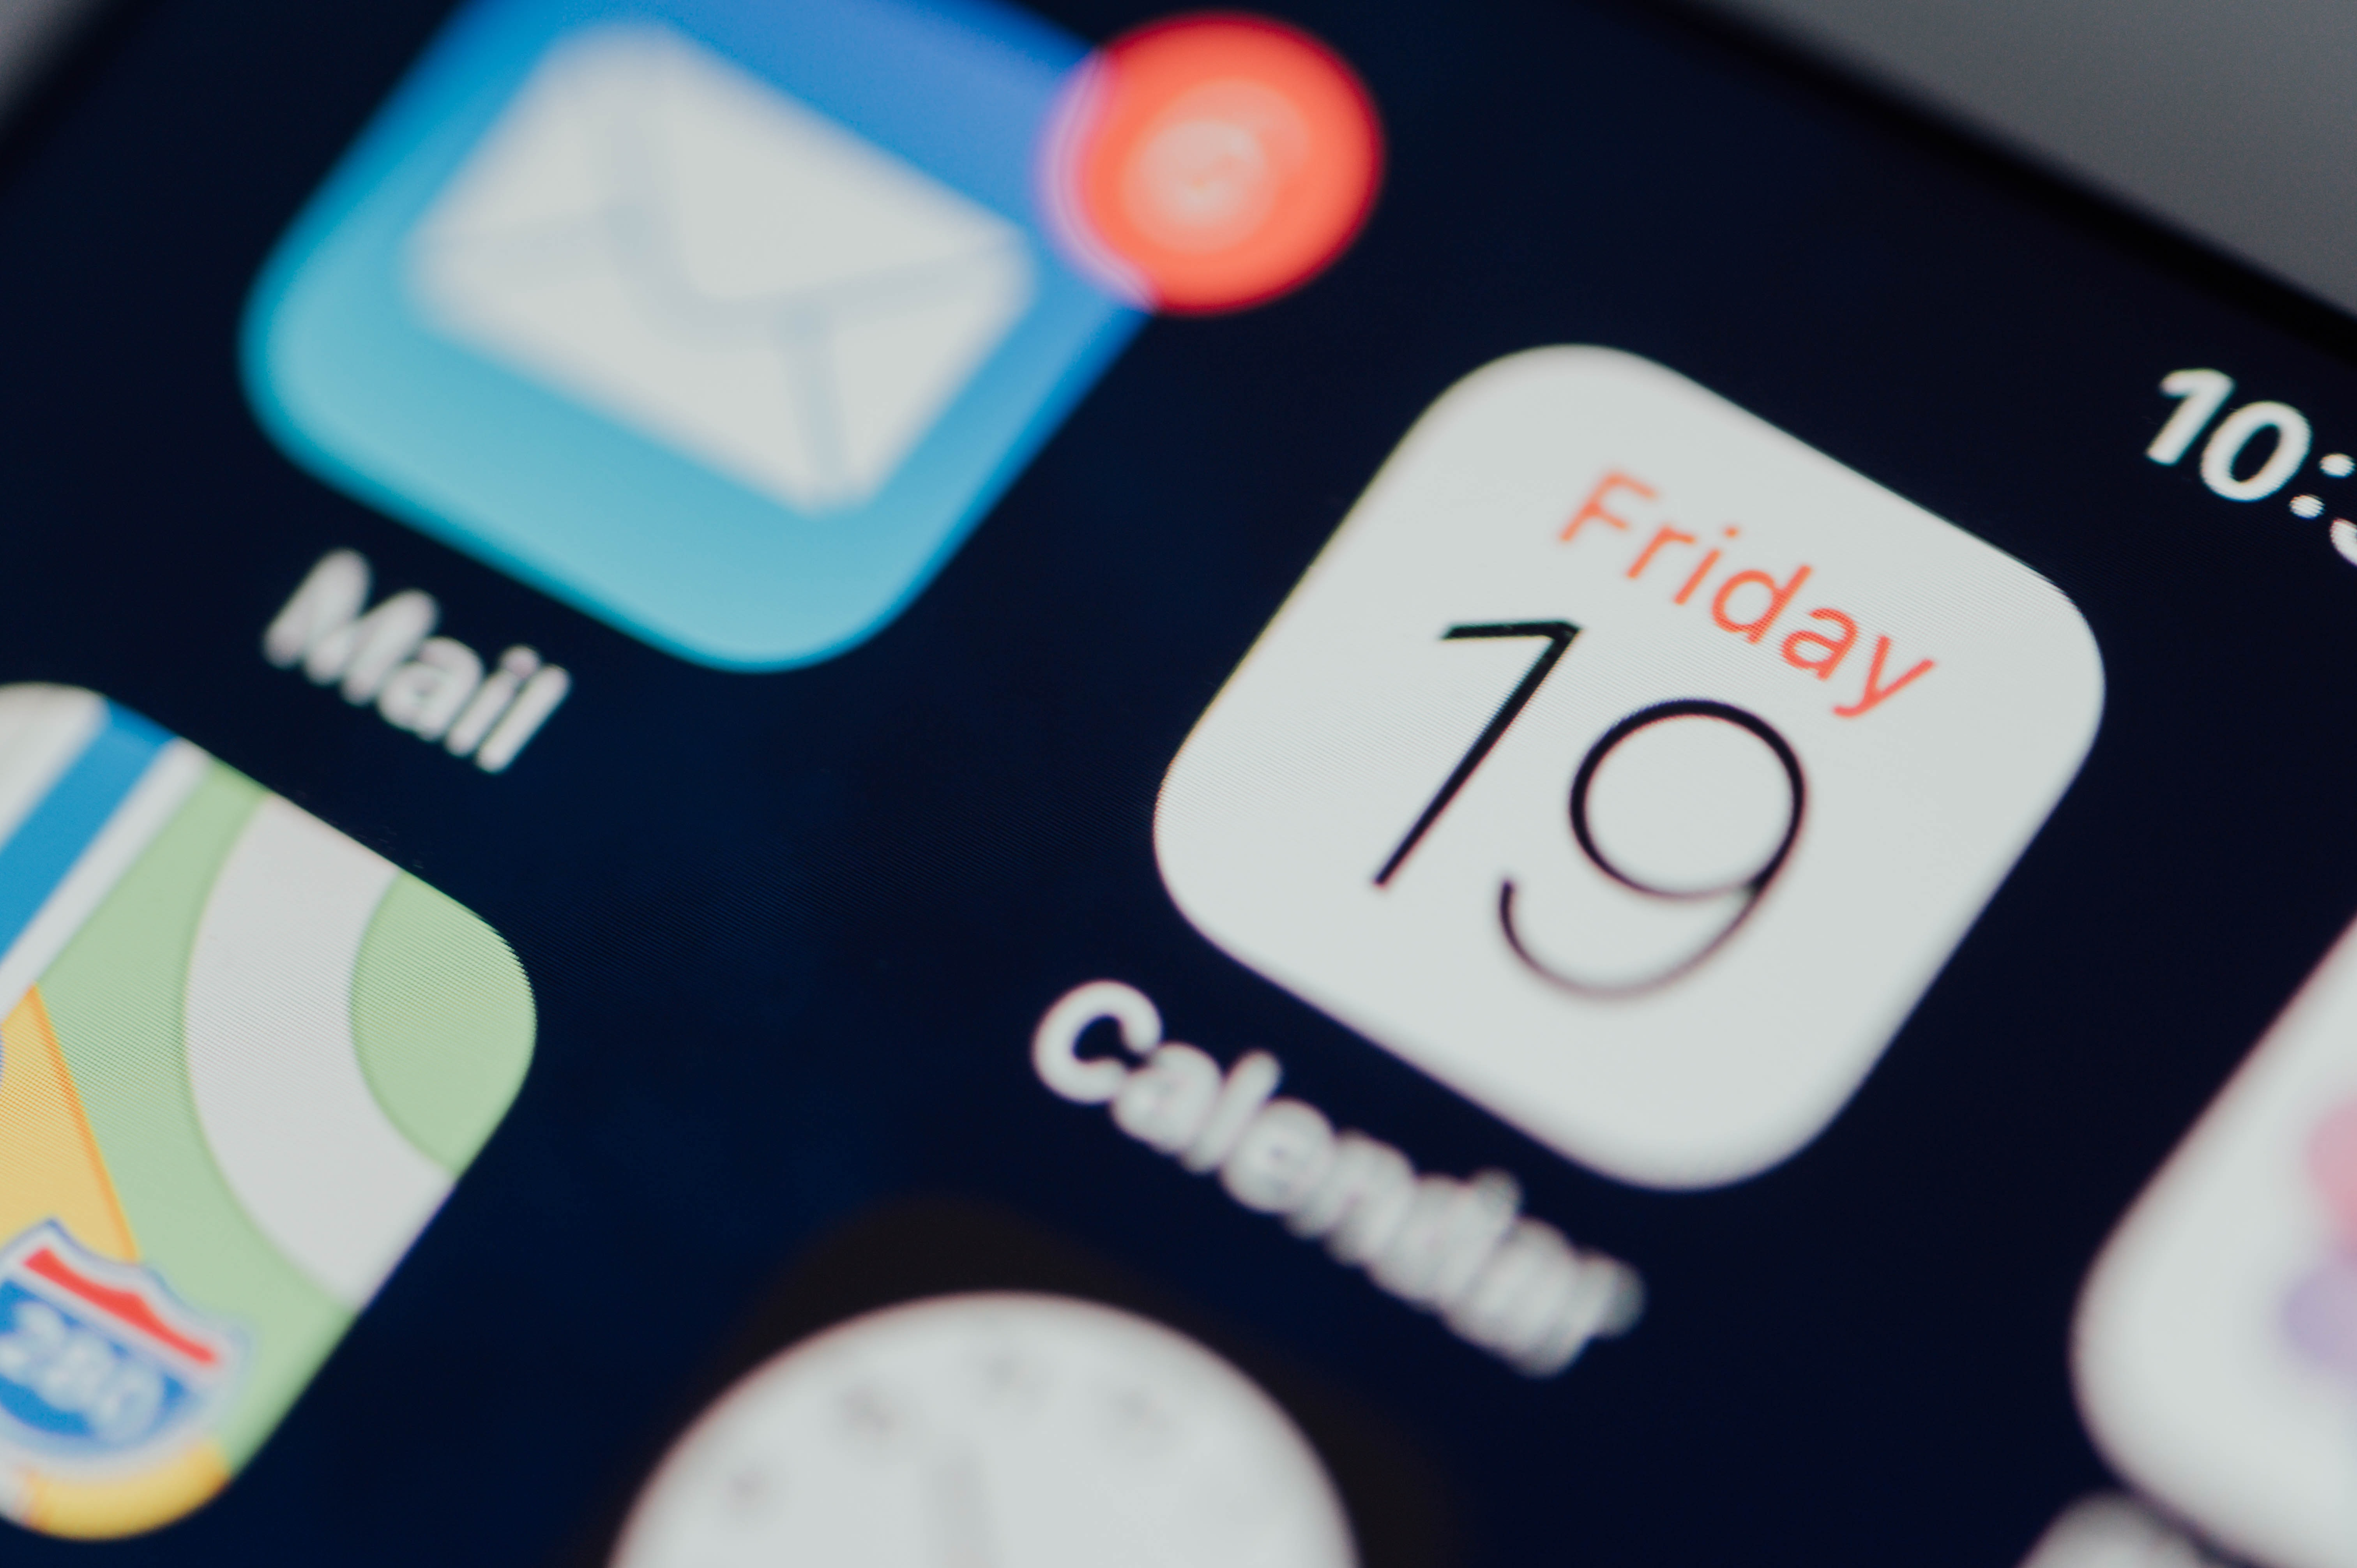 iPhone showing calendar